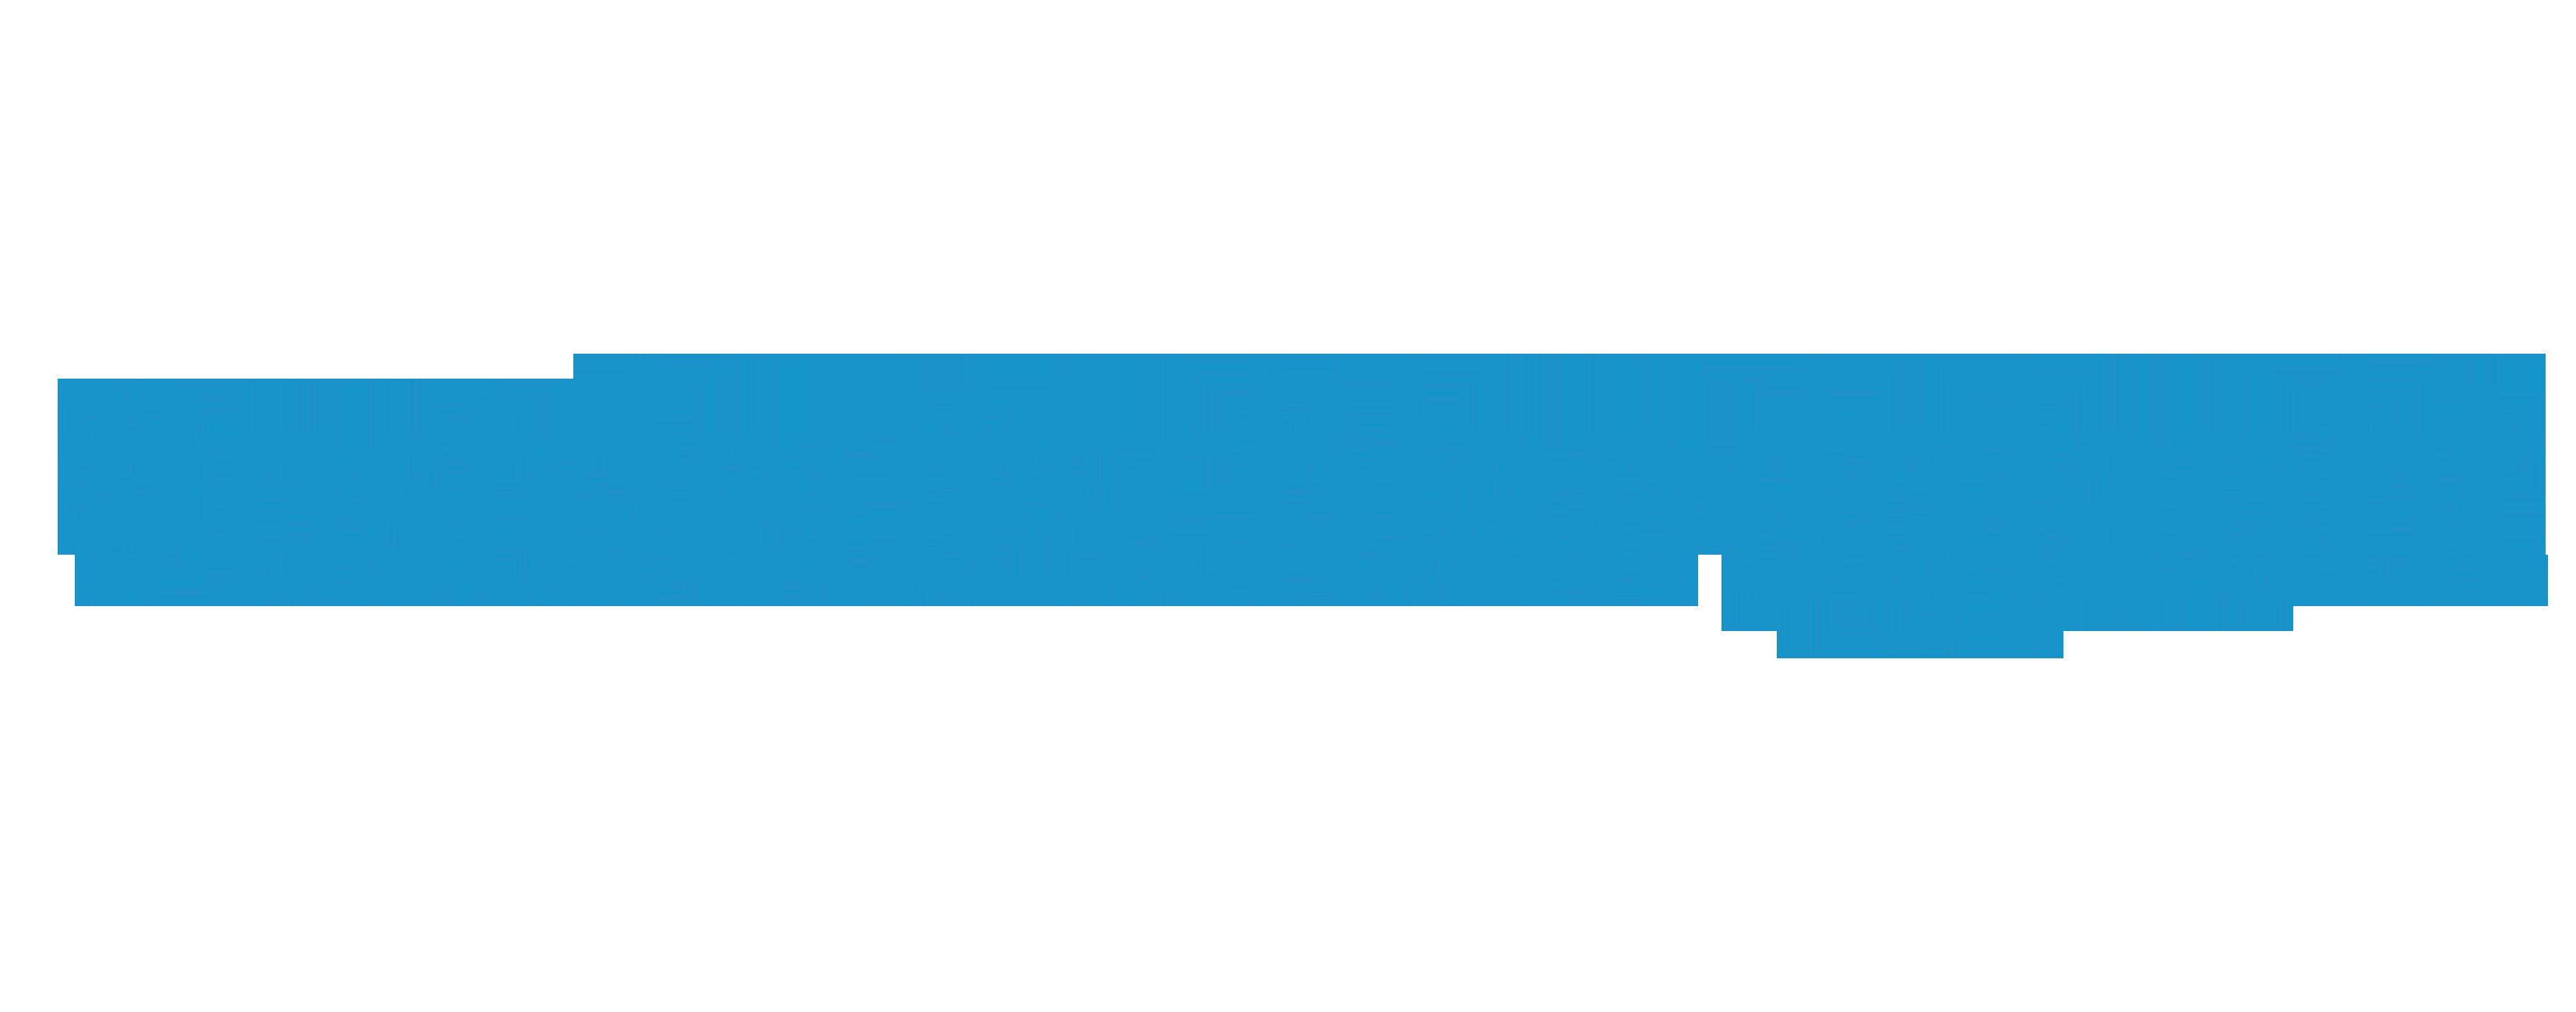 Ostdeutschlandglaubt